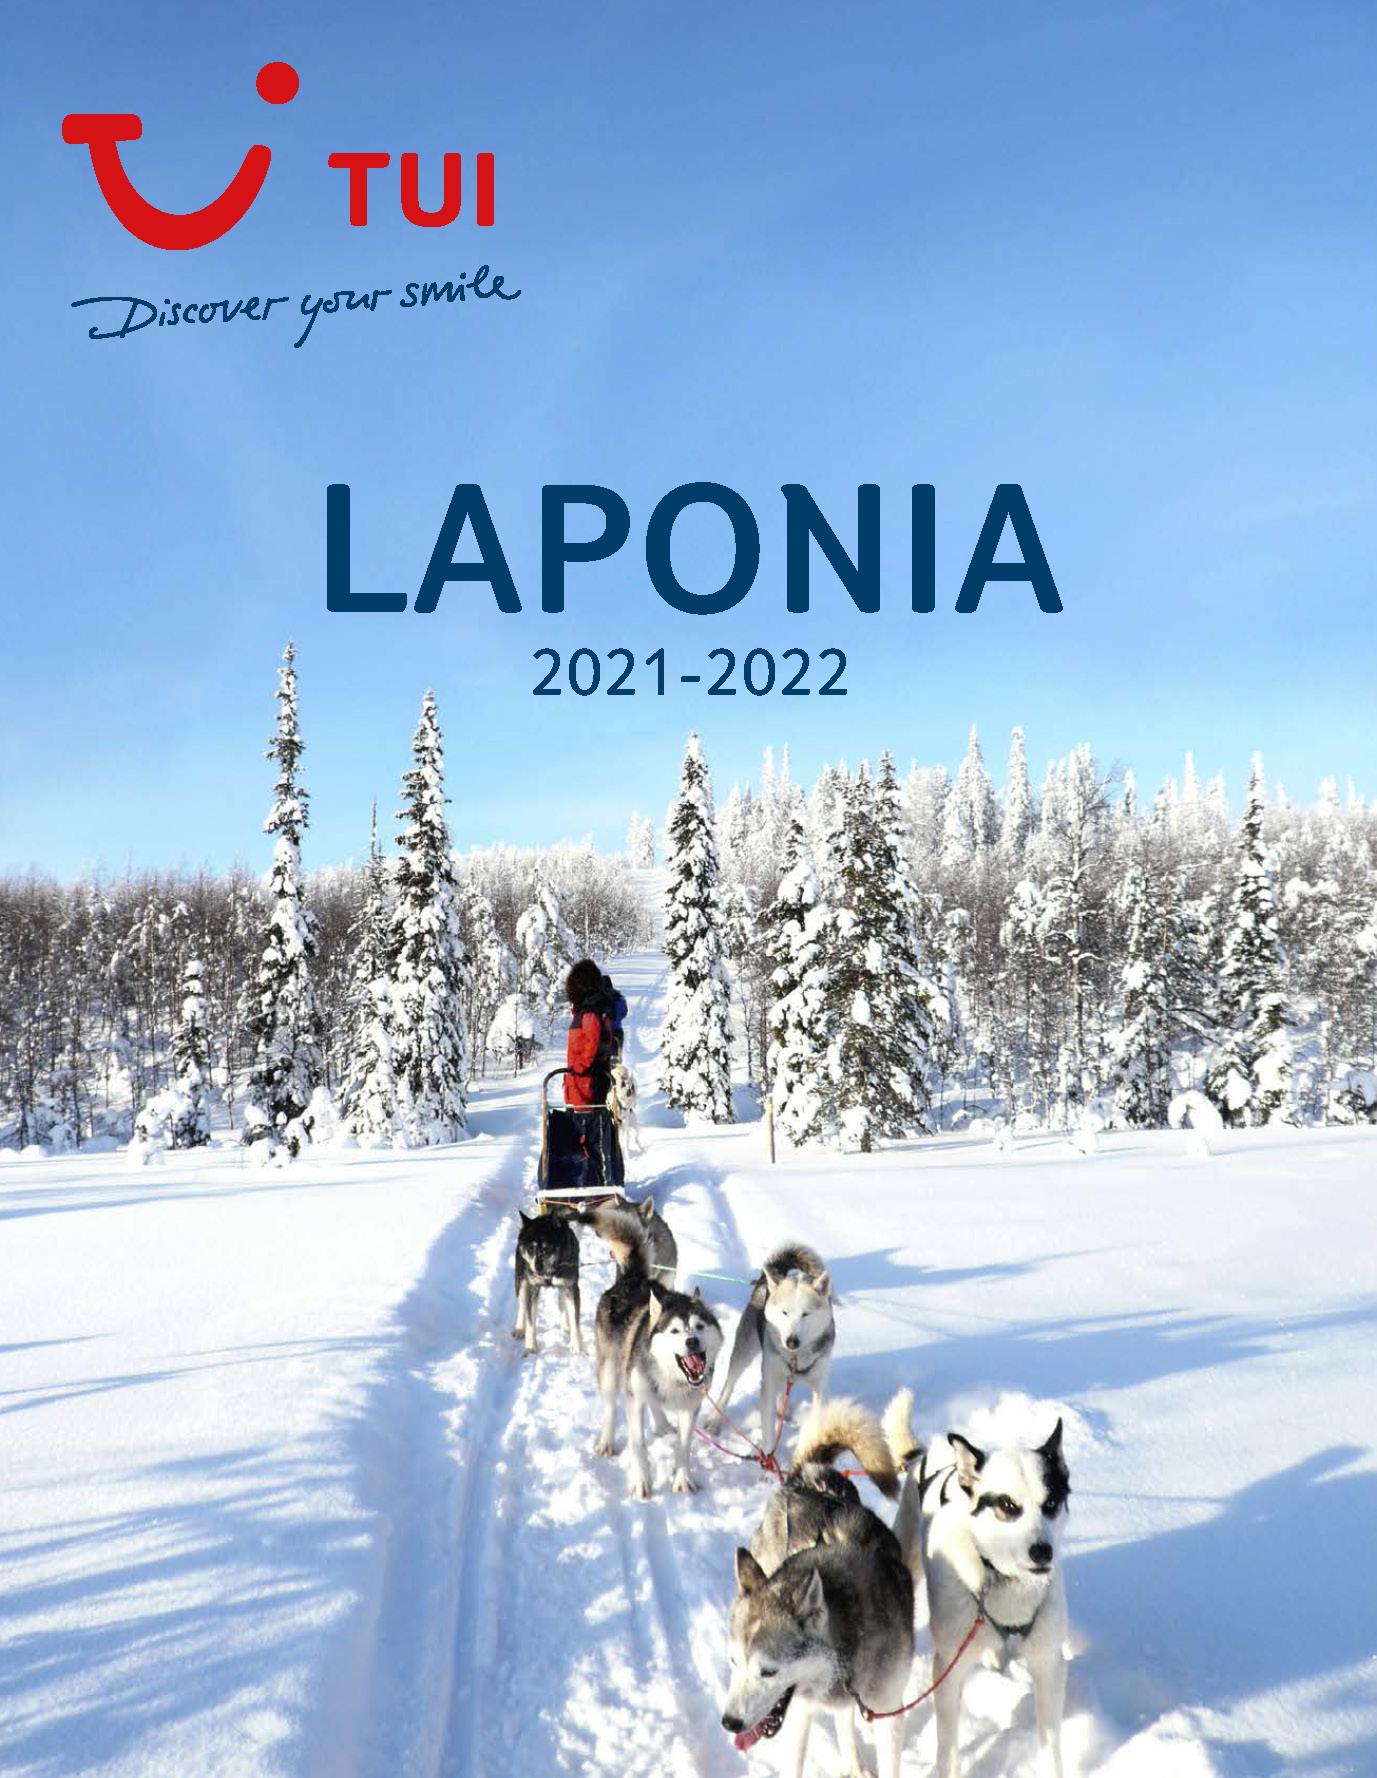 Catalogo TUI Ambassador Tours Laponia 2021-2022